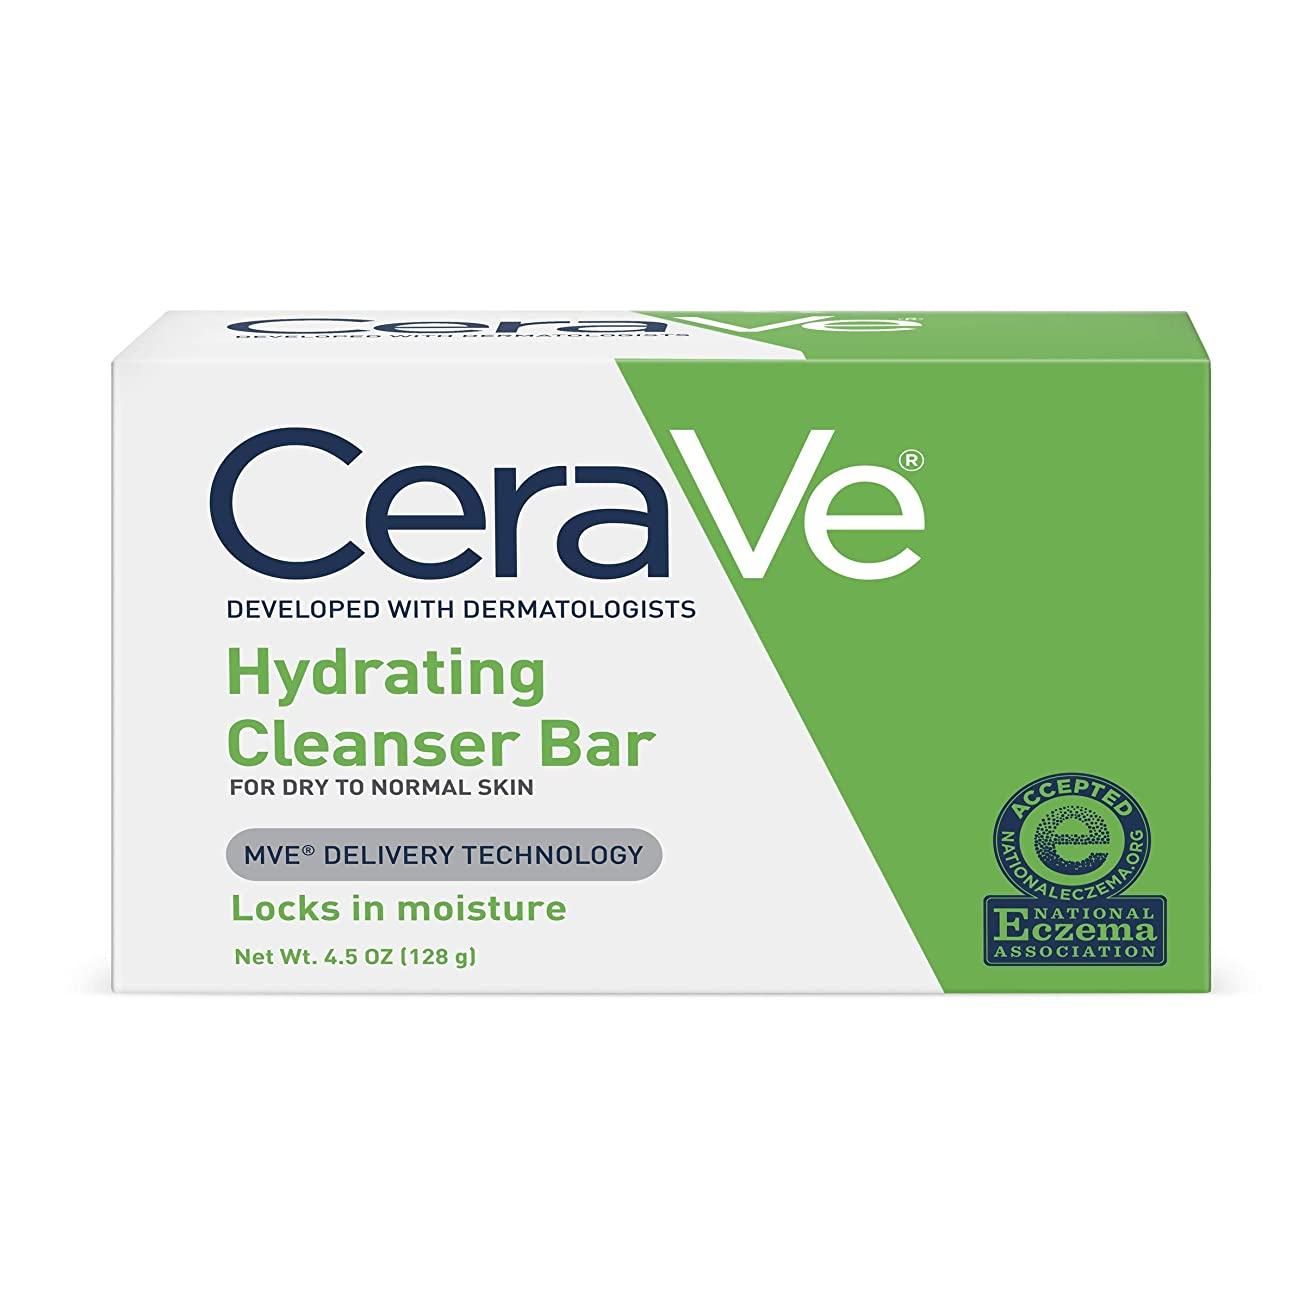 CeraVe 正常皮膚とハイドレイティングクレンザーバードライ - 4.5オズ、5パック